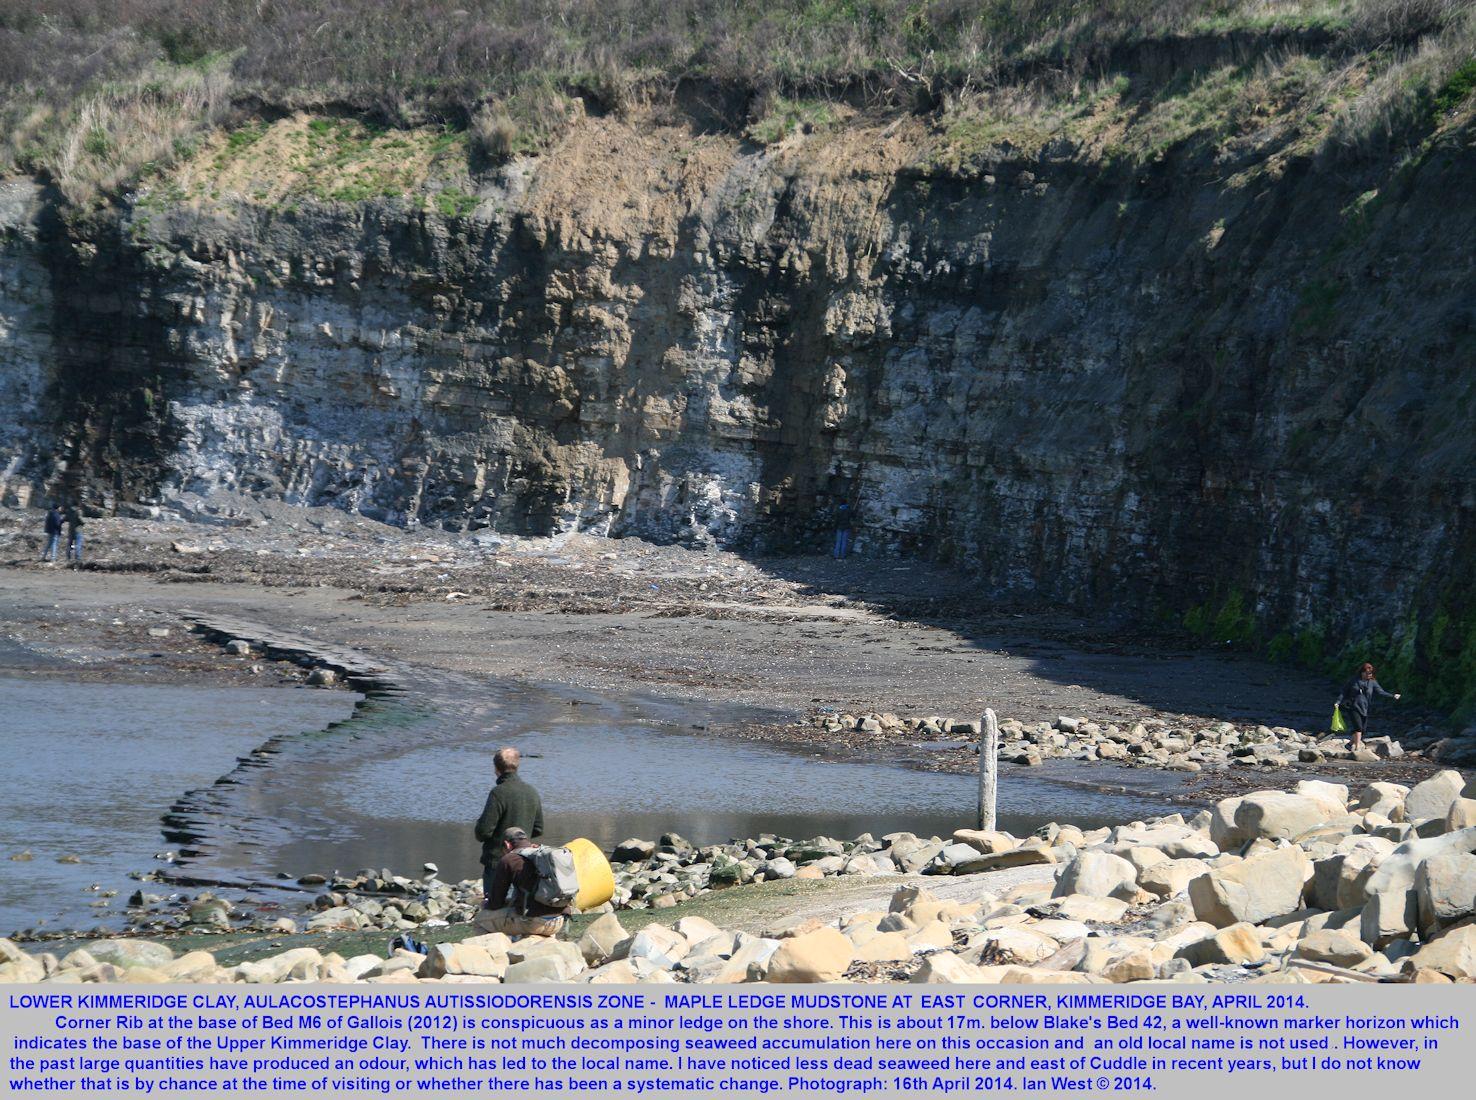 The Maple Ledge Mudstone Member of the Lower Kimmeridge Clay at the eastern corner of Kimmeridge Bay, Dorset, 16th April 2014